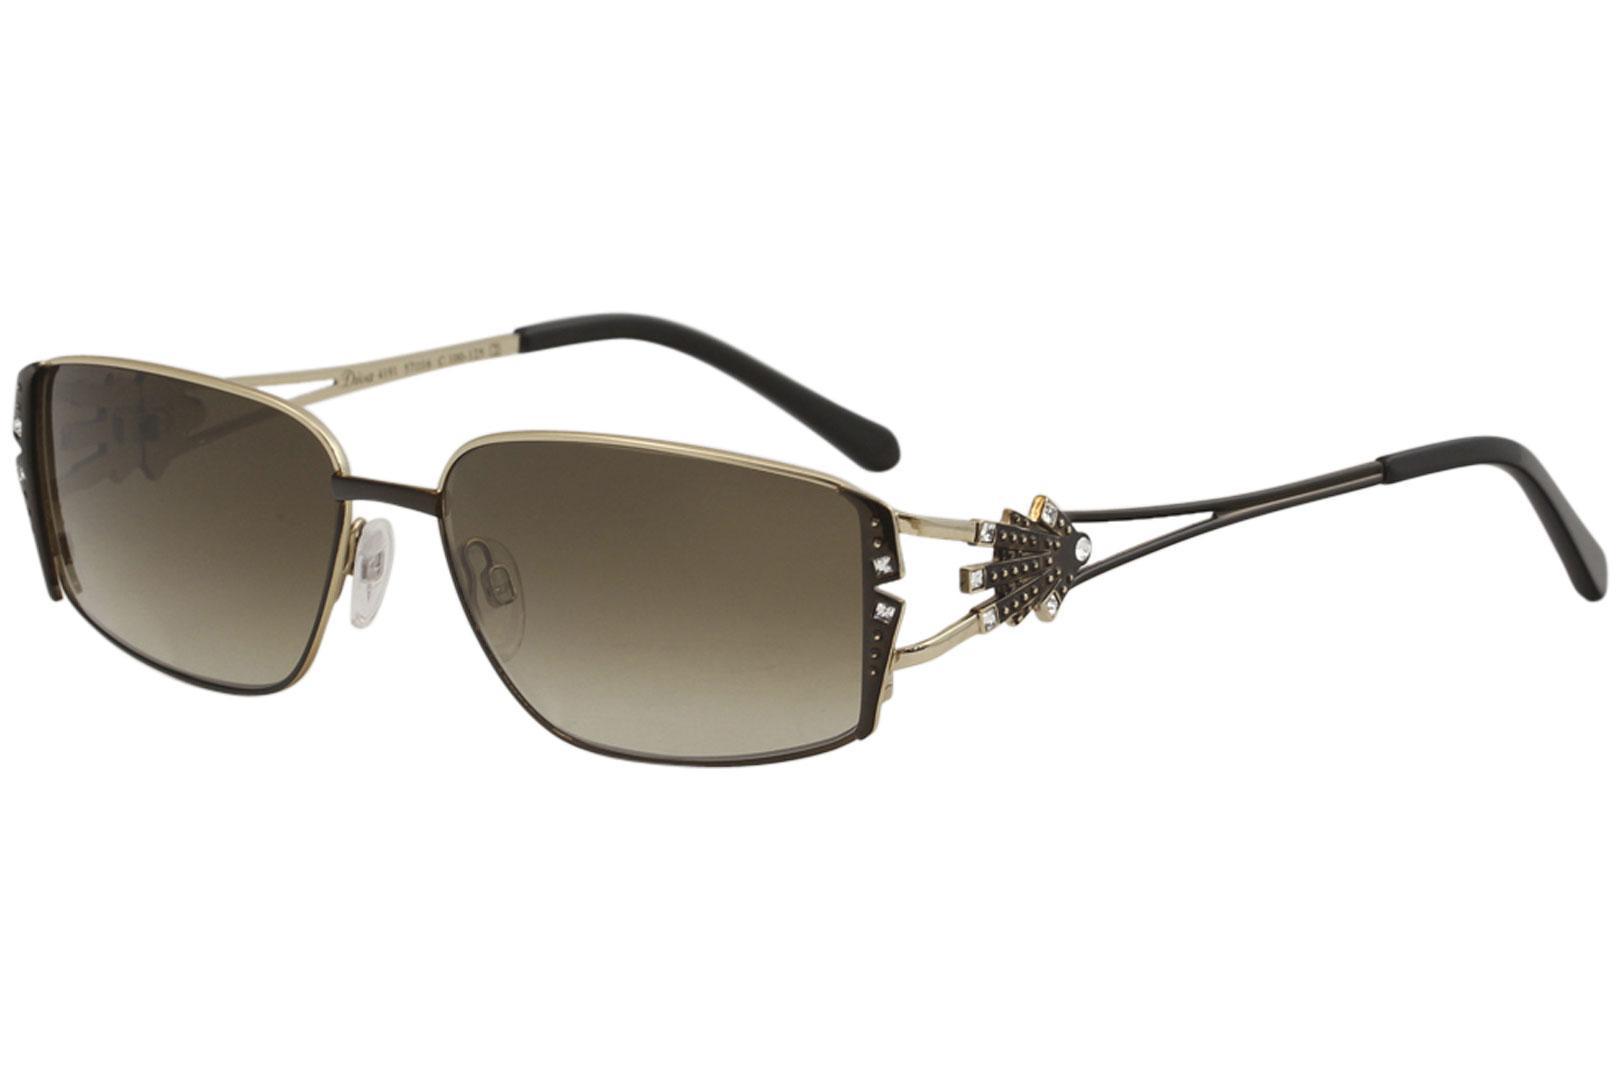 Image of Diva Women's 4191 Fashion Rectangle Sunglasses - Brown Gold/Brown Gradient   100 - Lens 57 Bridge 16 Temple 125mm